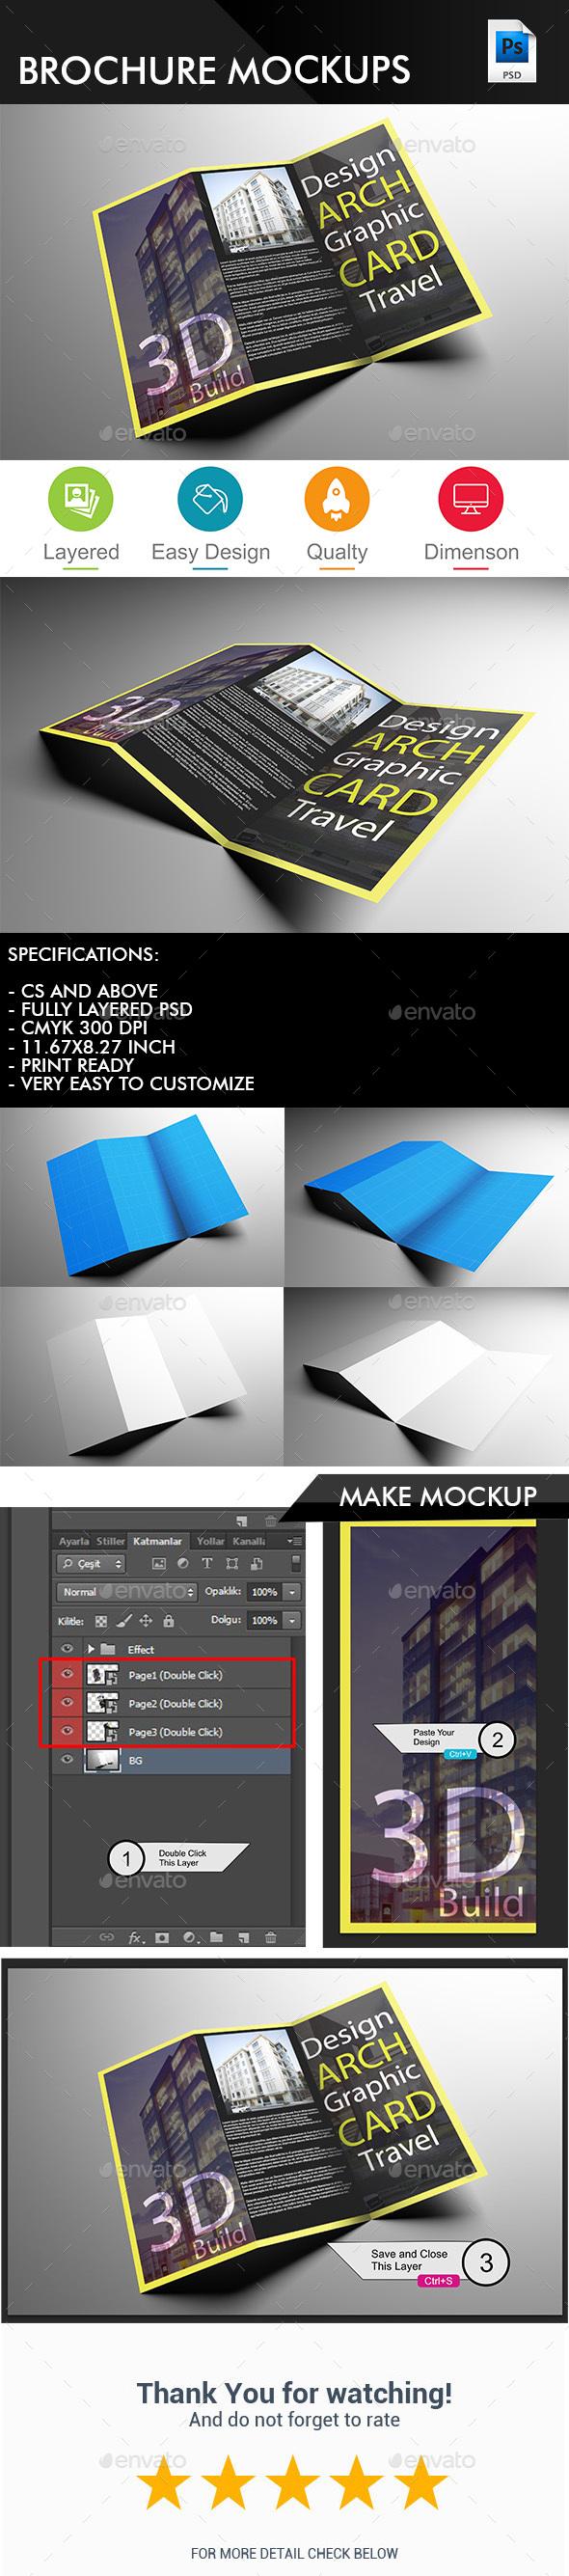 Tri Fold Brochure MockUps - Brochure MockUps - Brochures Print